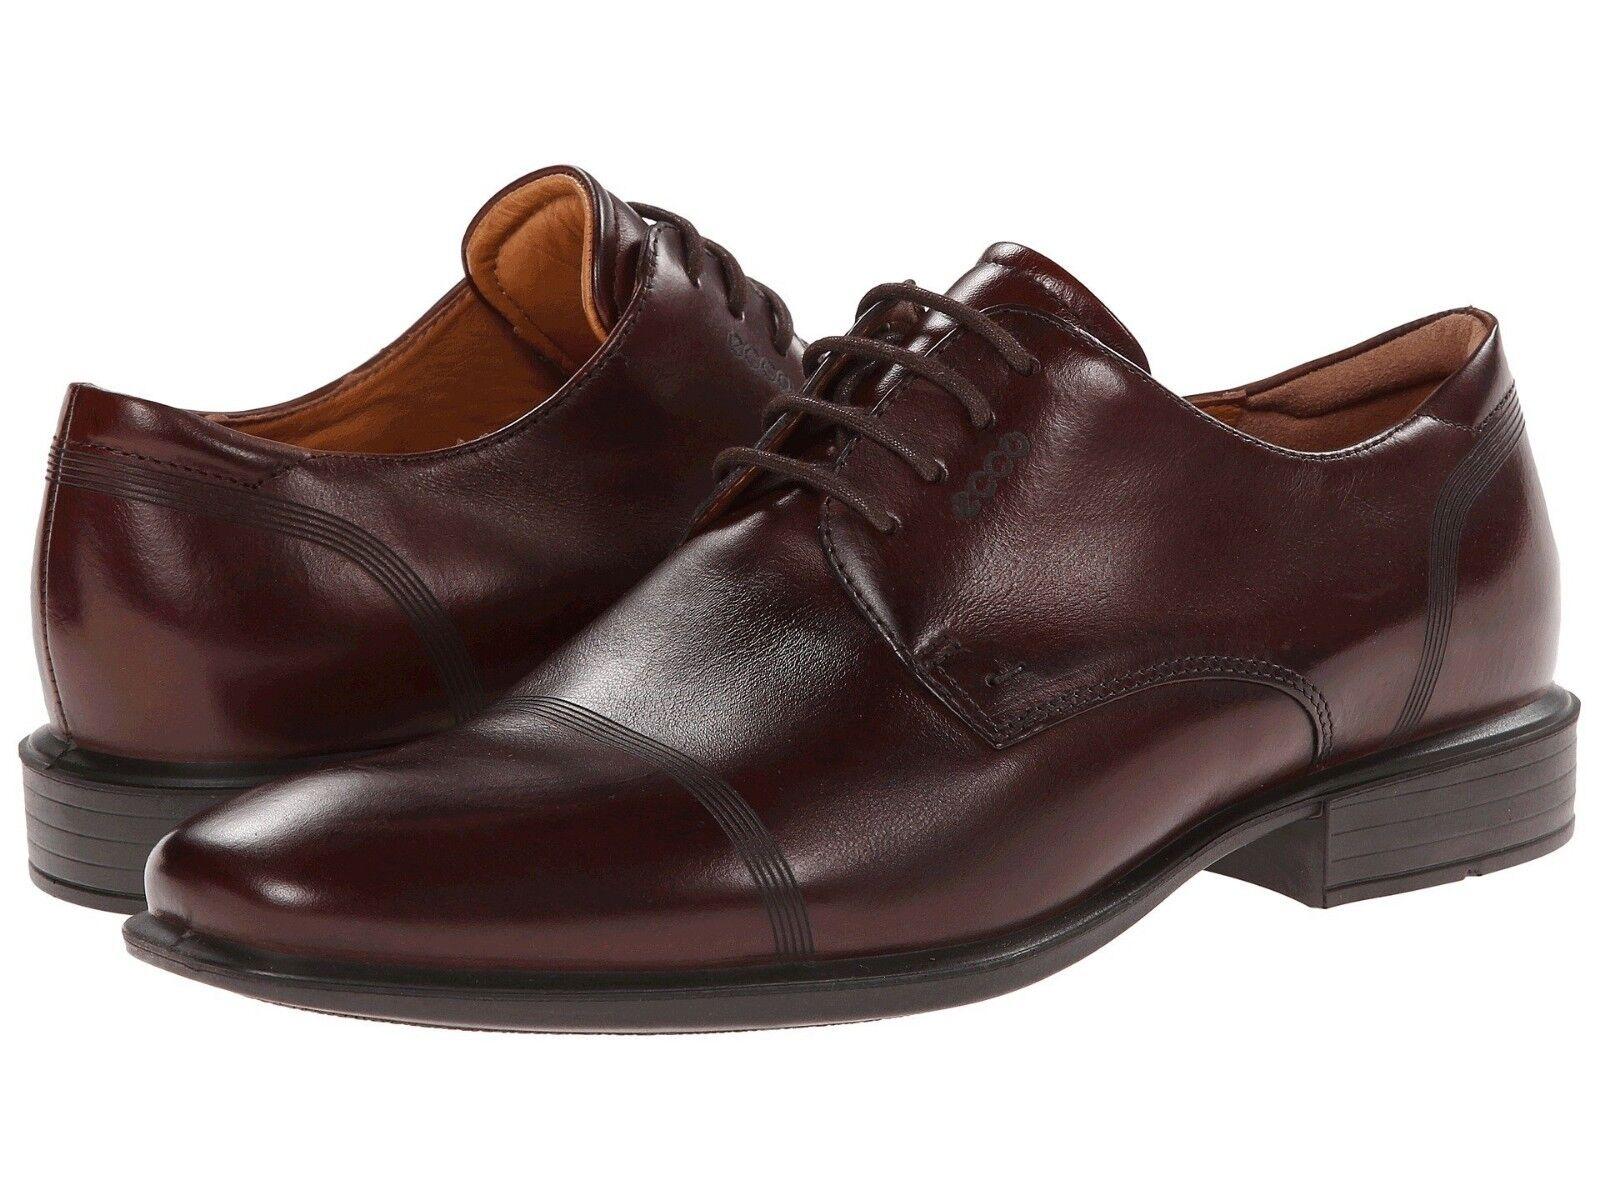 Zapatos de vestir Gorra Para Hombre ECCO Cairo-Toe Lazo, 631714 0101 4 Visón Varios Tamaños